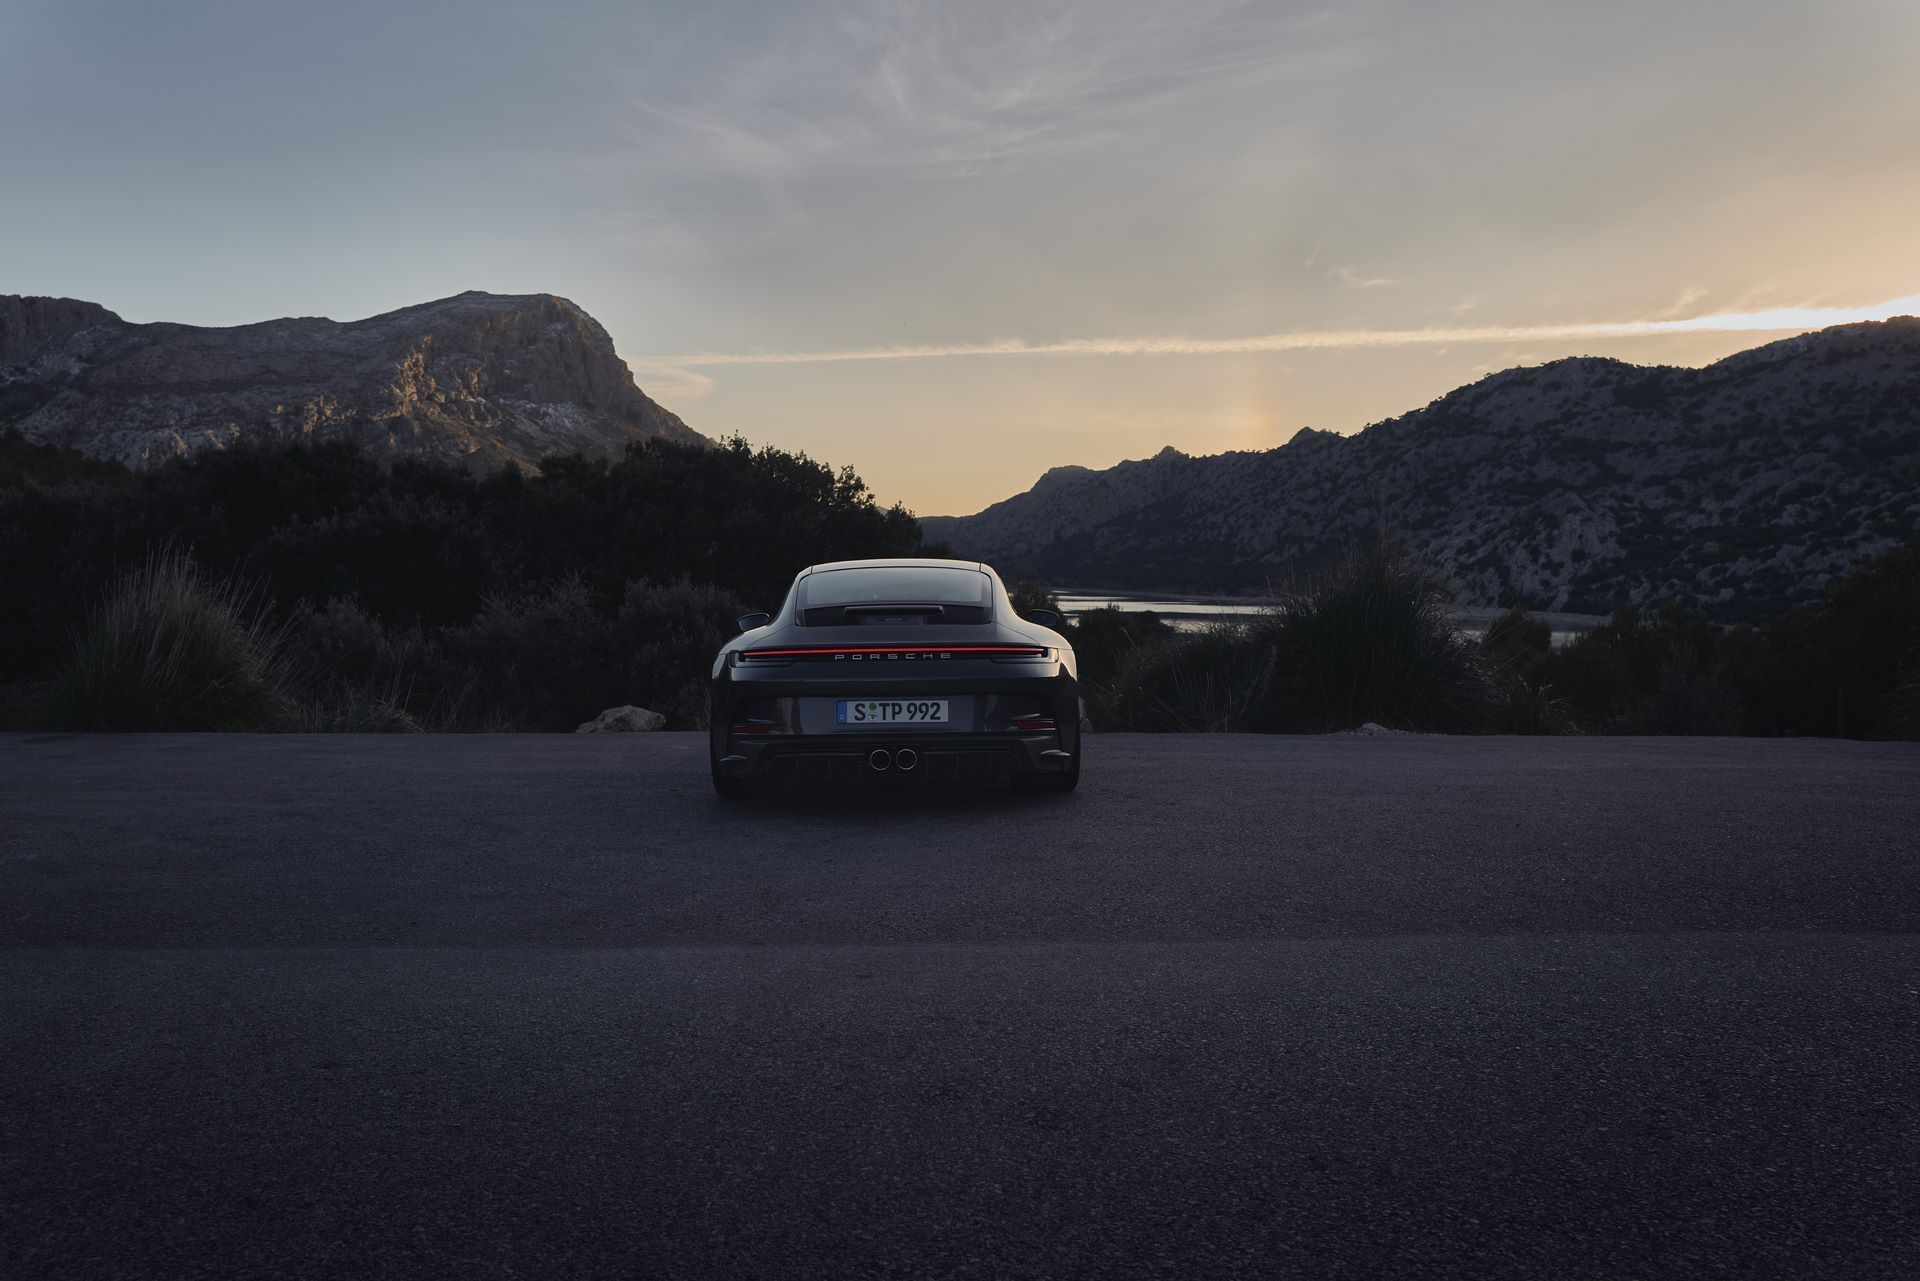 Porsche-911-GT3-Touring-Package-19